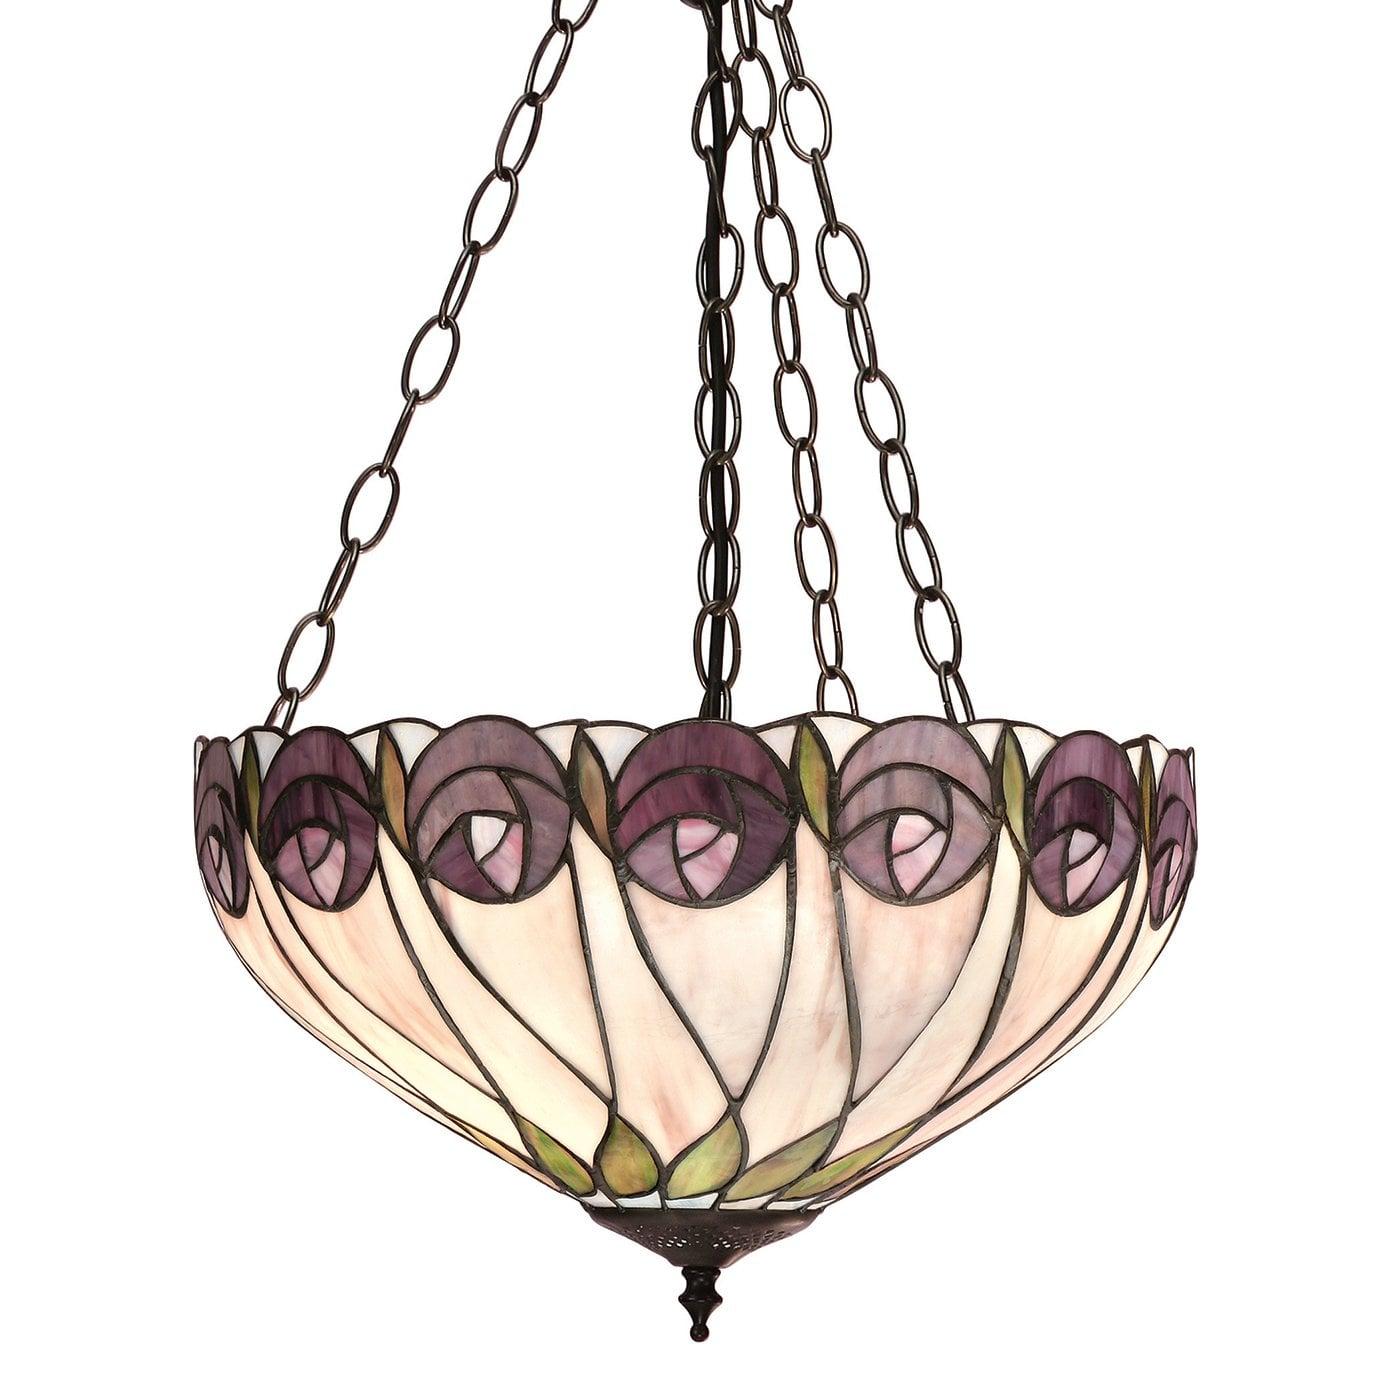 Interiors 1900 64175 Hutchinson Medium inverted 3lt pendant, Tiffany